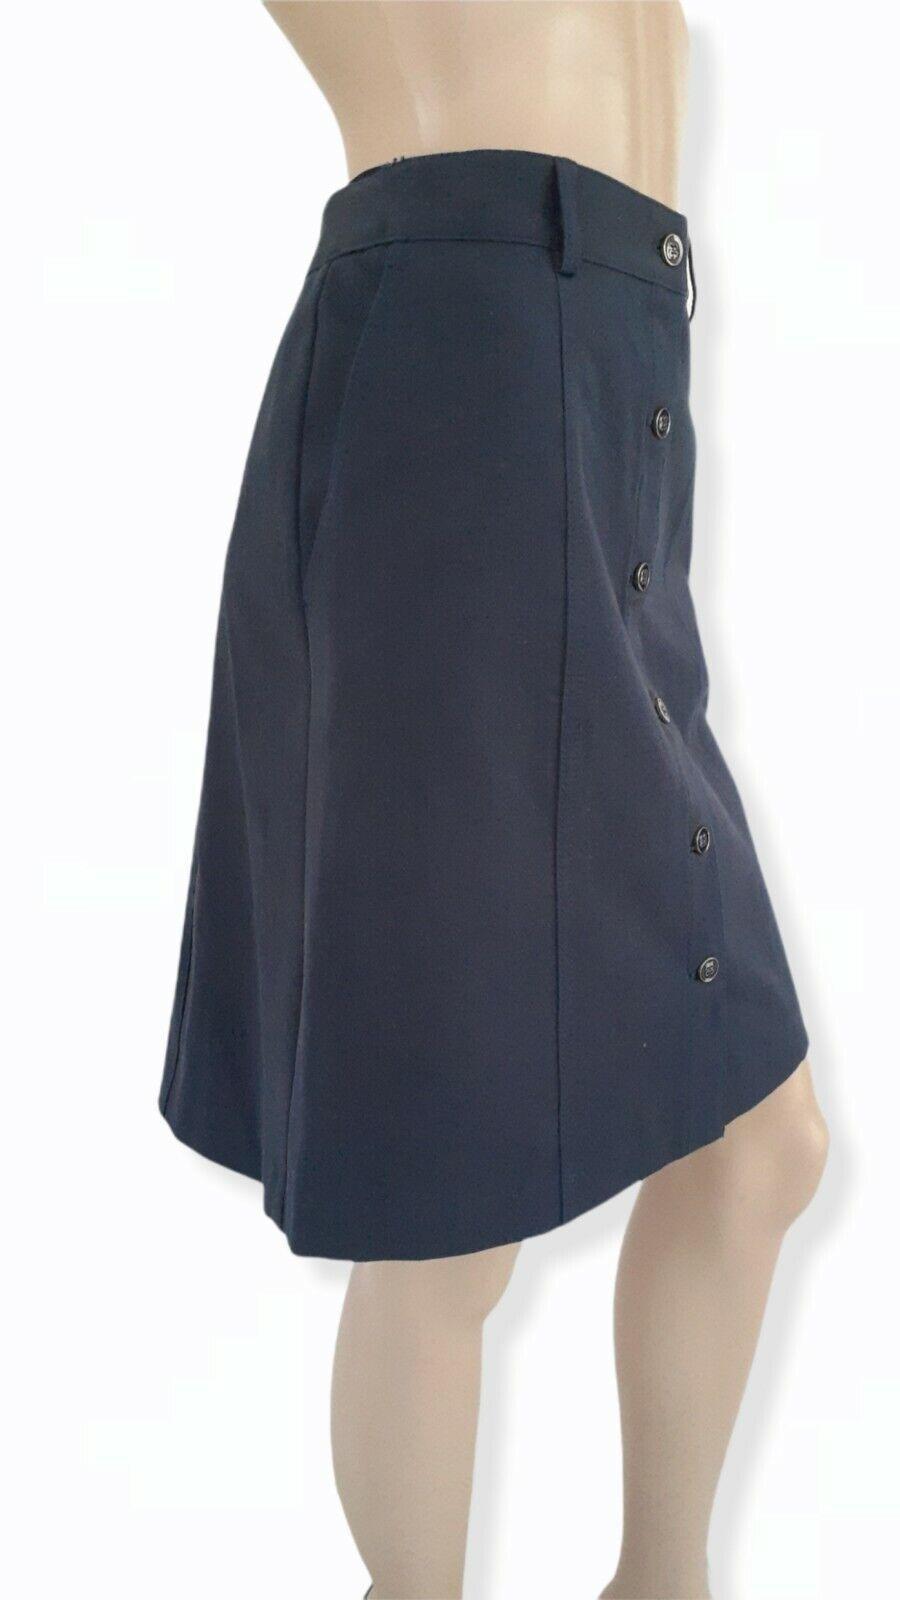 J McLaughlin Teal Button Front A Line Skirt Size 2 - image 3